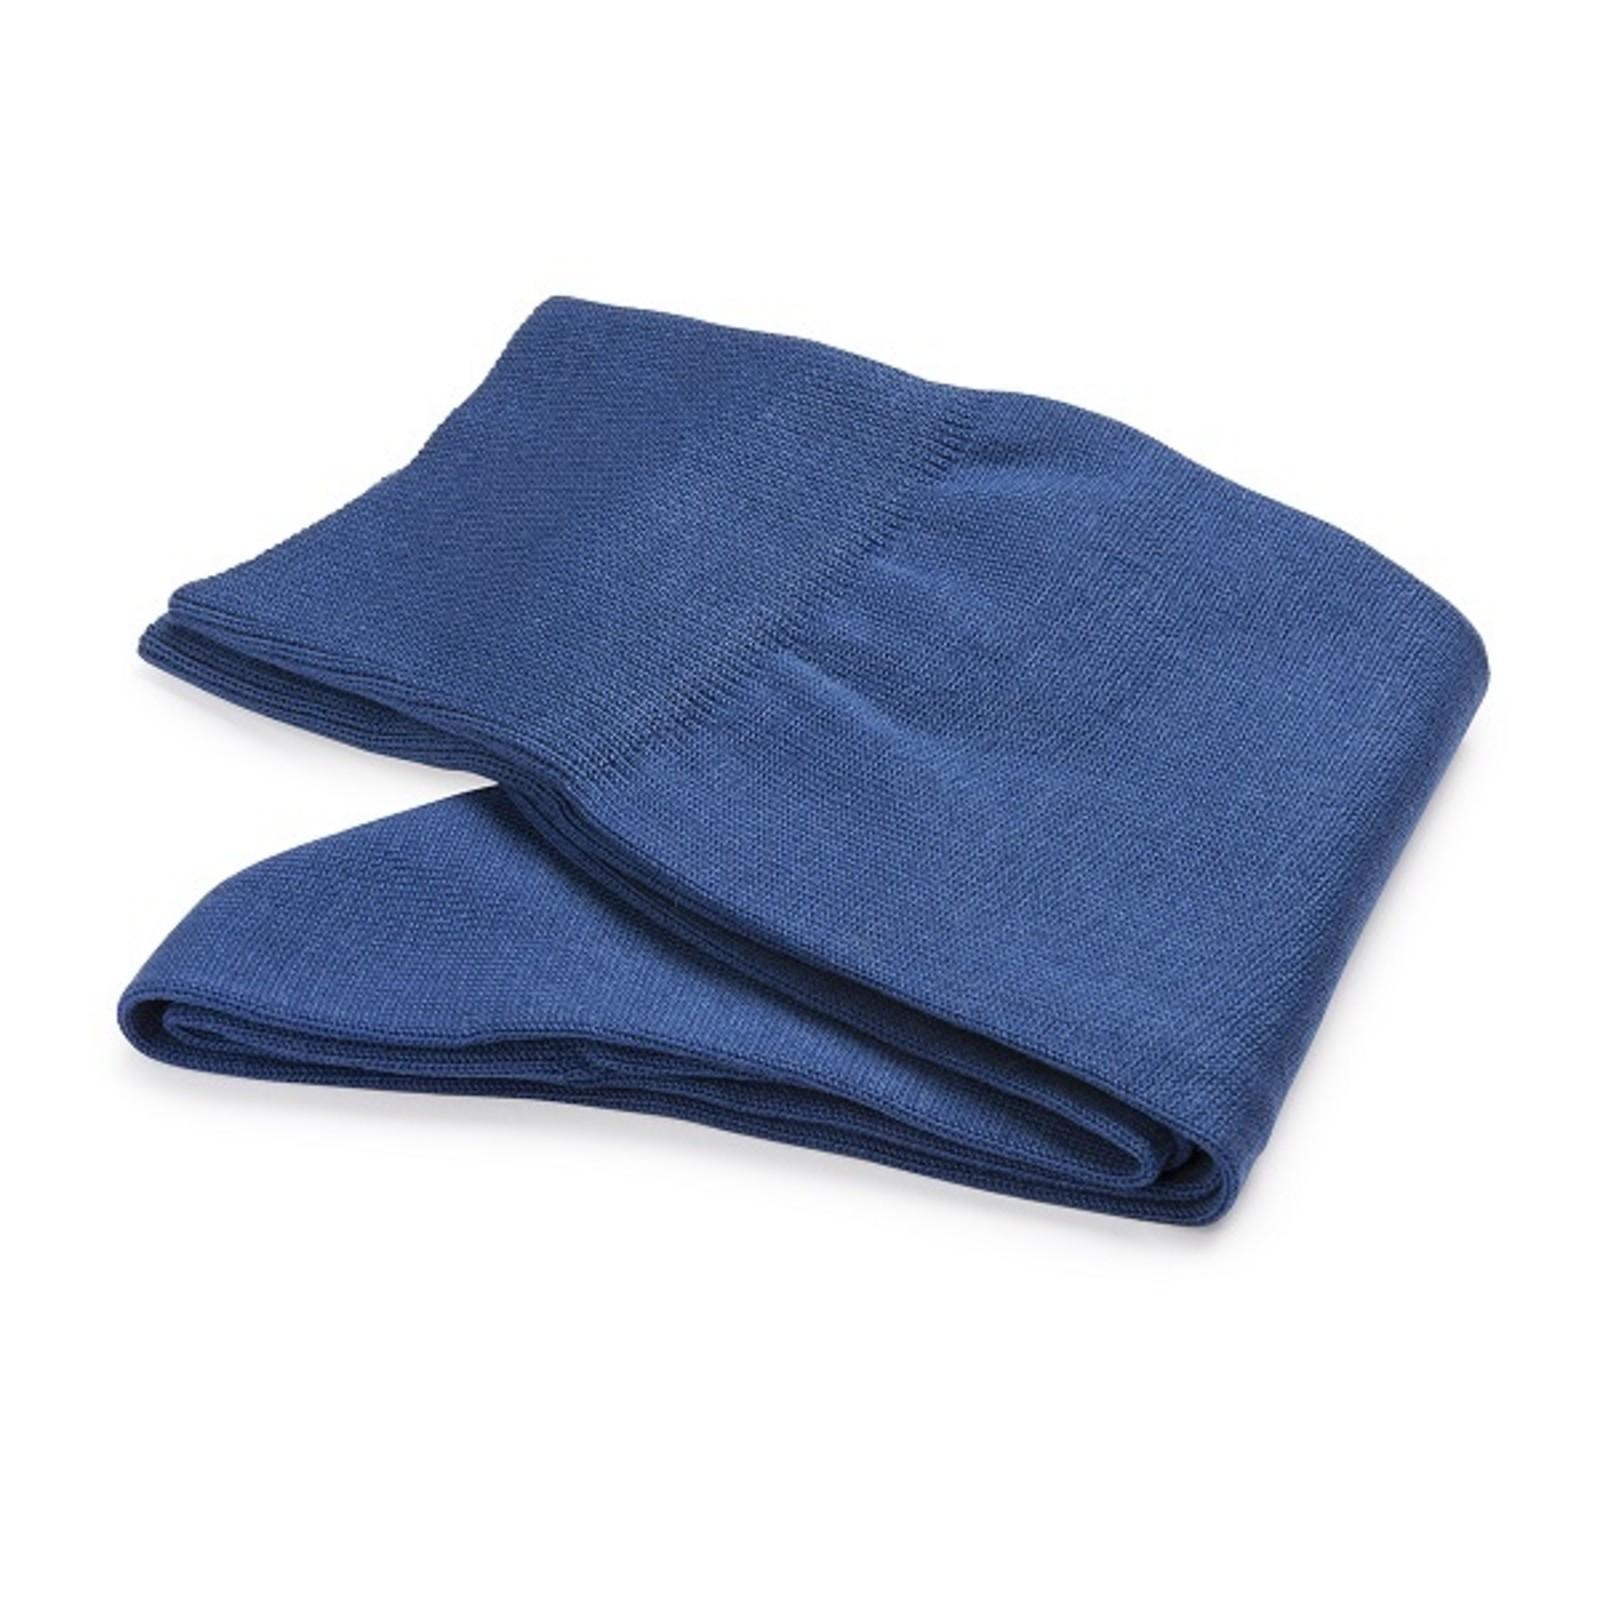 Carlo Lanza Cobalt blue socks cotton